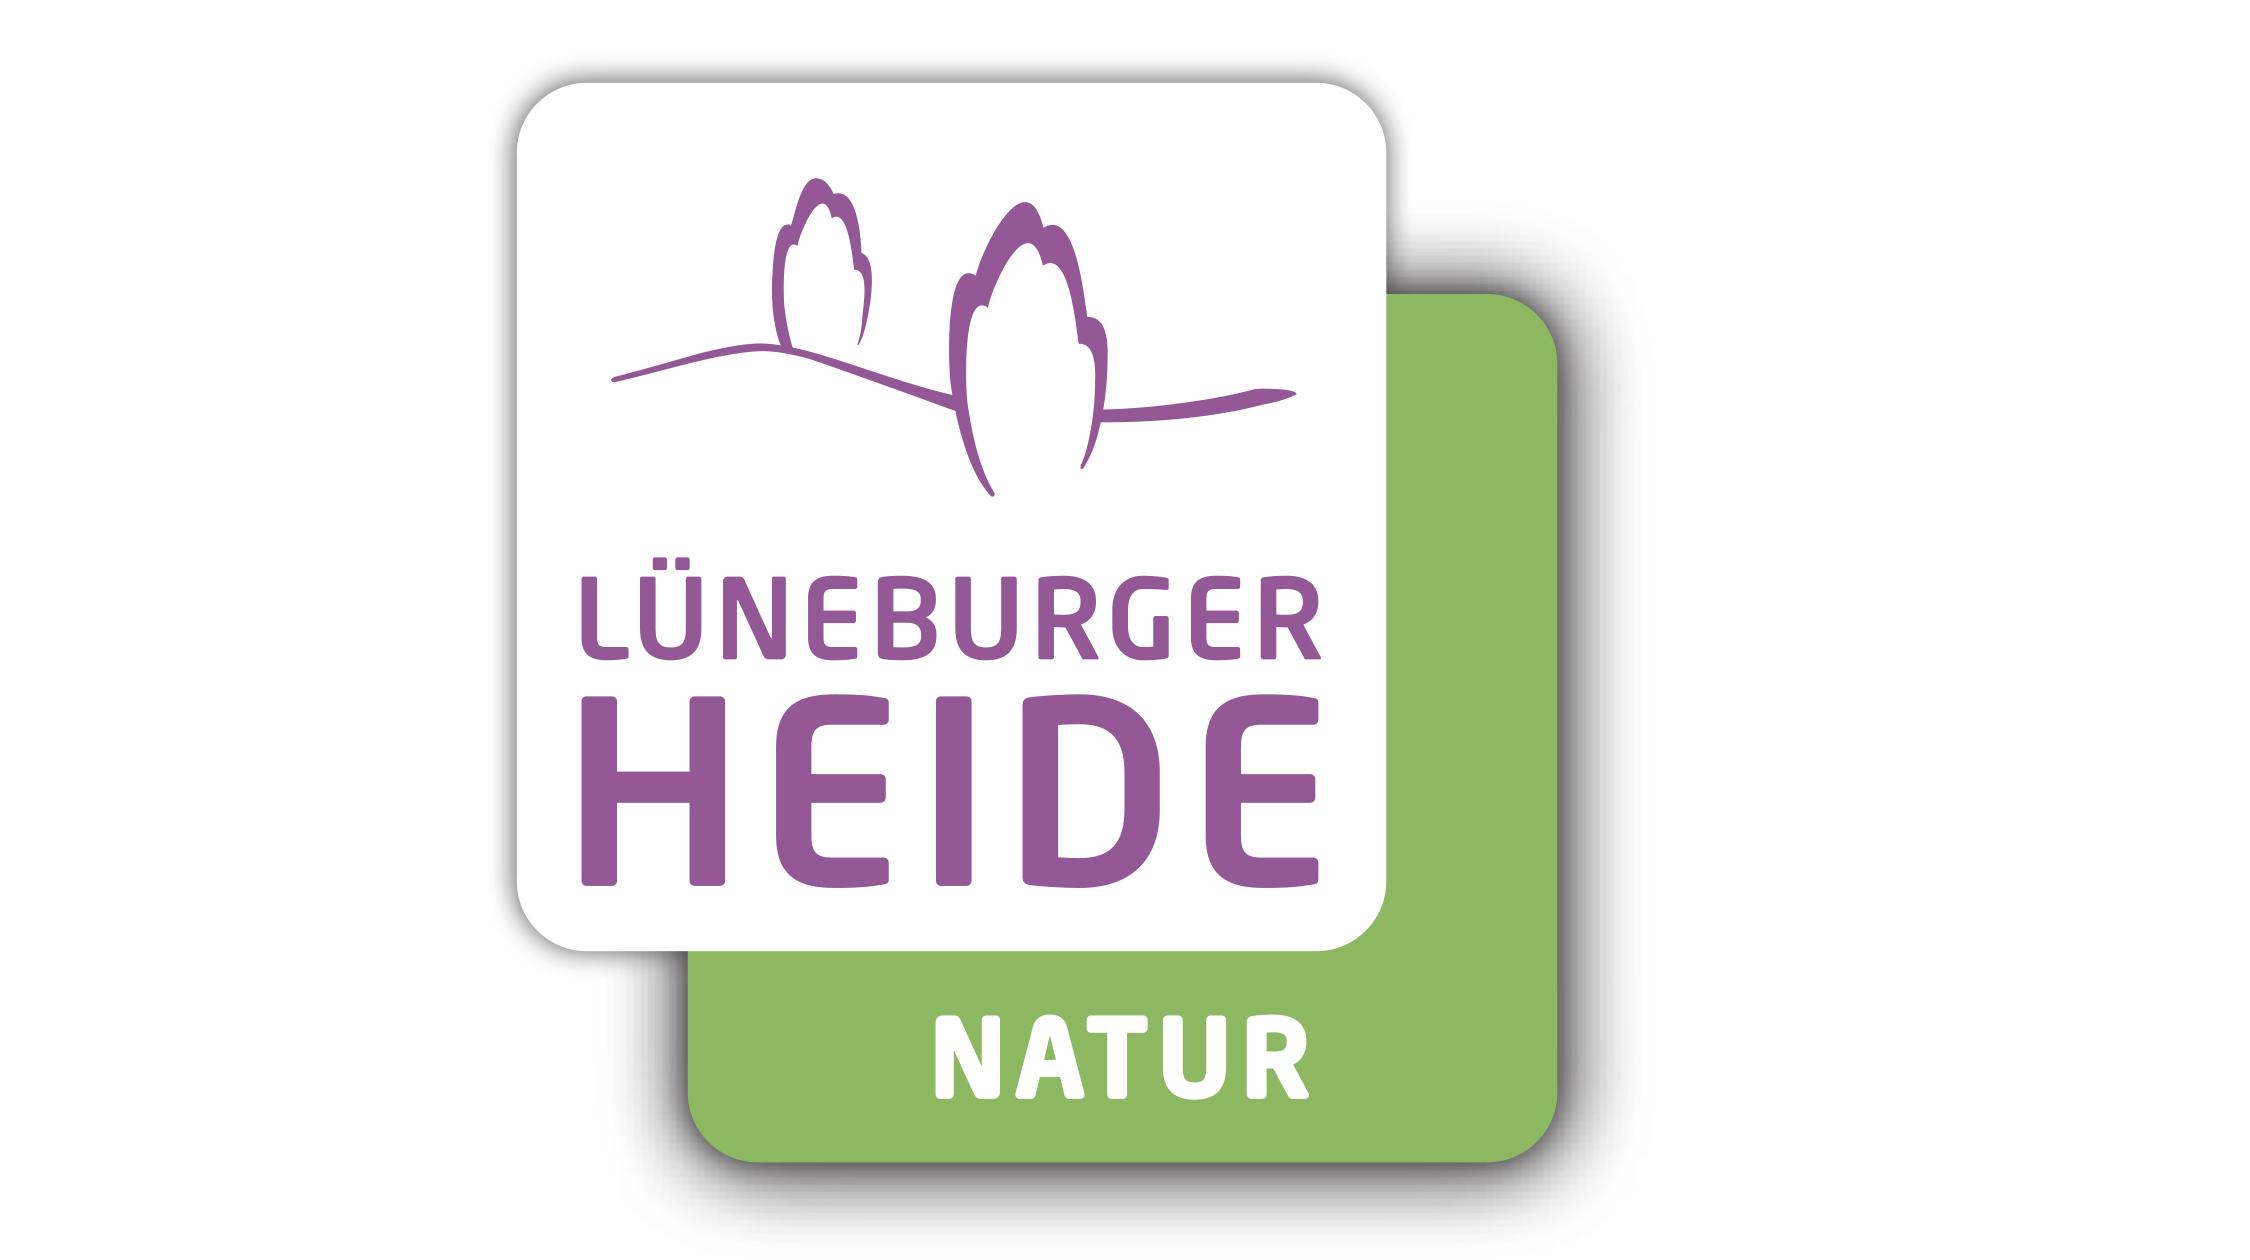 Lüneburger Heide GmbH